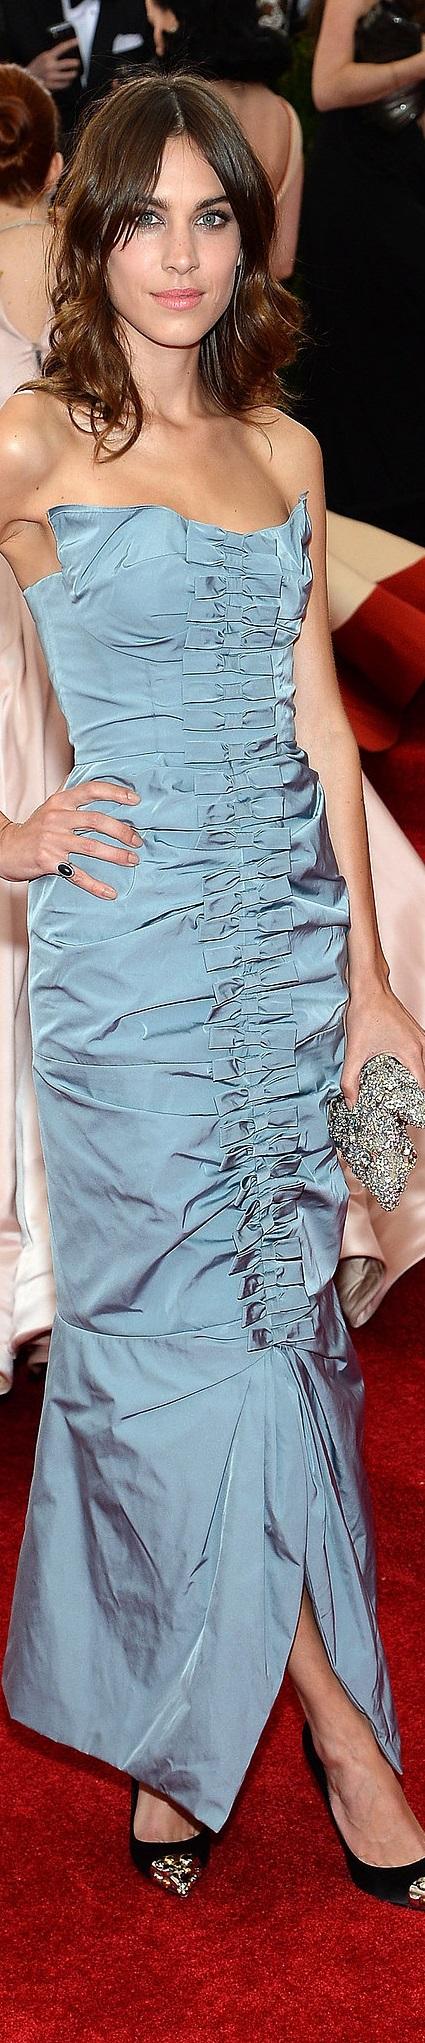 Peaches geldof wedding dress  Alexa Chung in Nina Ricci  CELEBRITY DRESS  Pinterest  Alexa